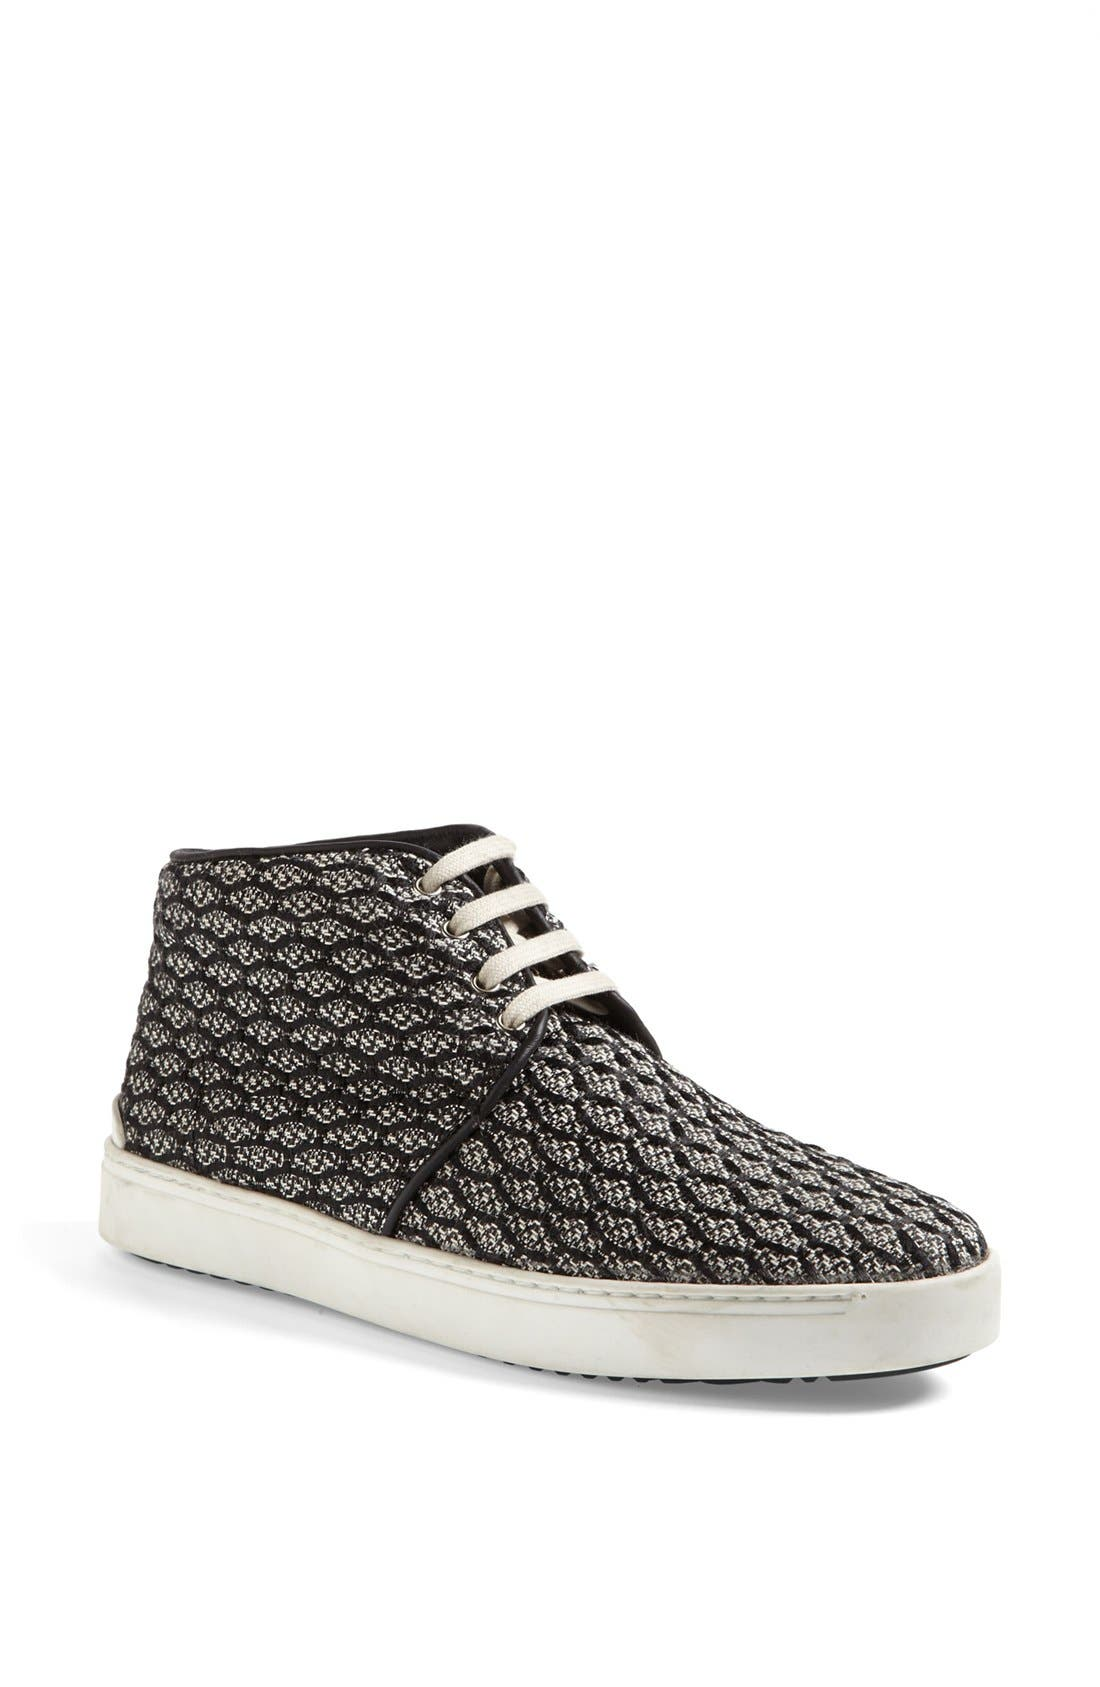 Alternate Image 1 Selected - rag & bone 'Kent' Sneaker (Online Only)